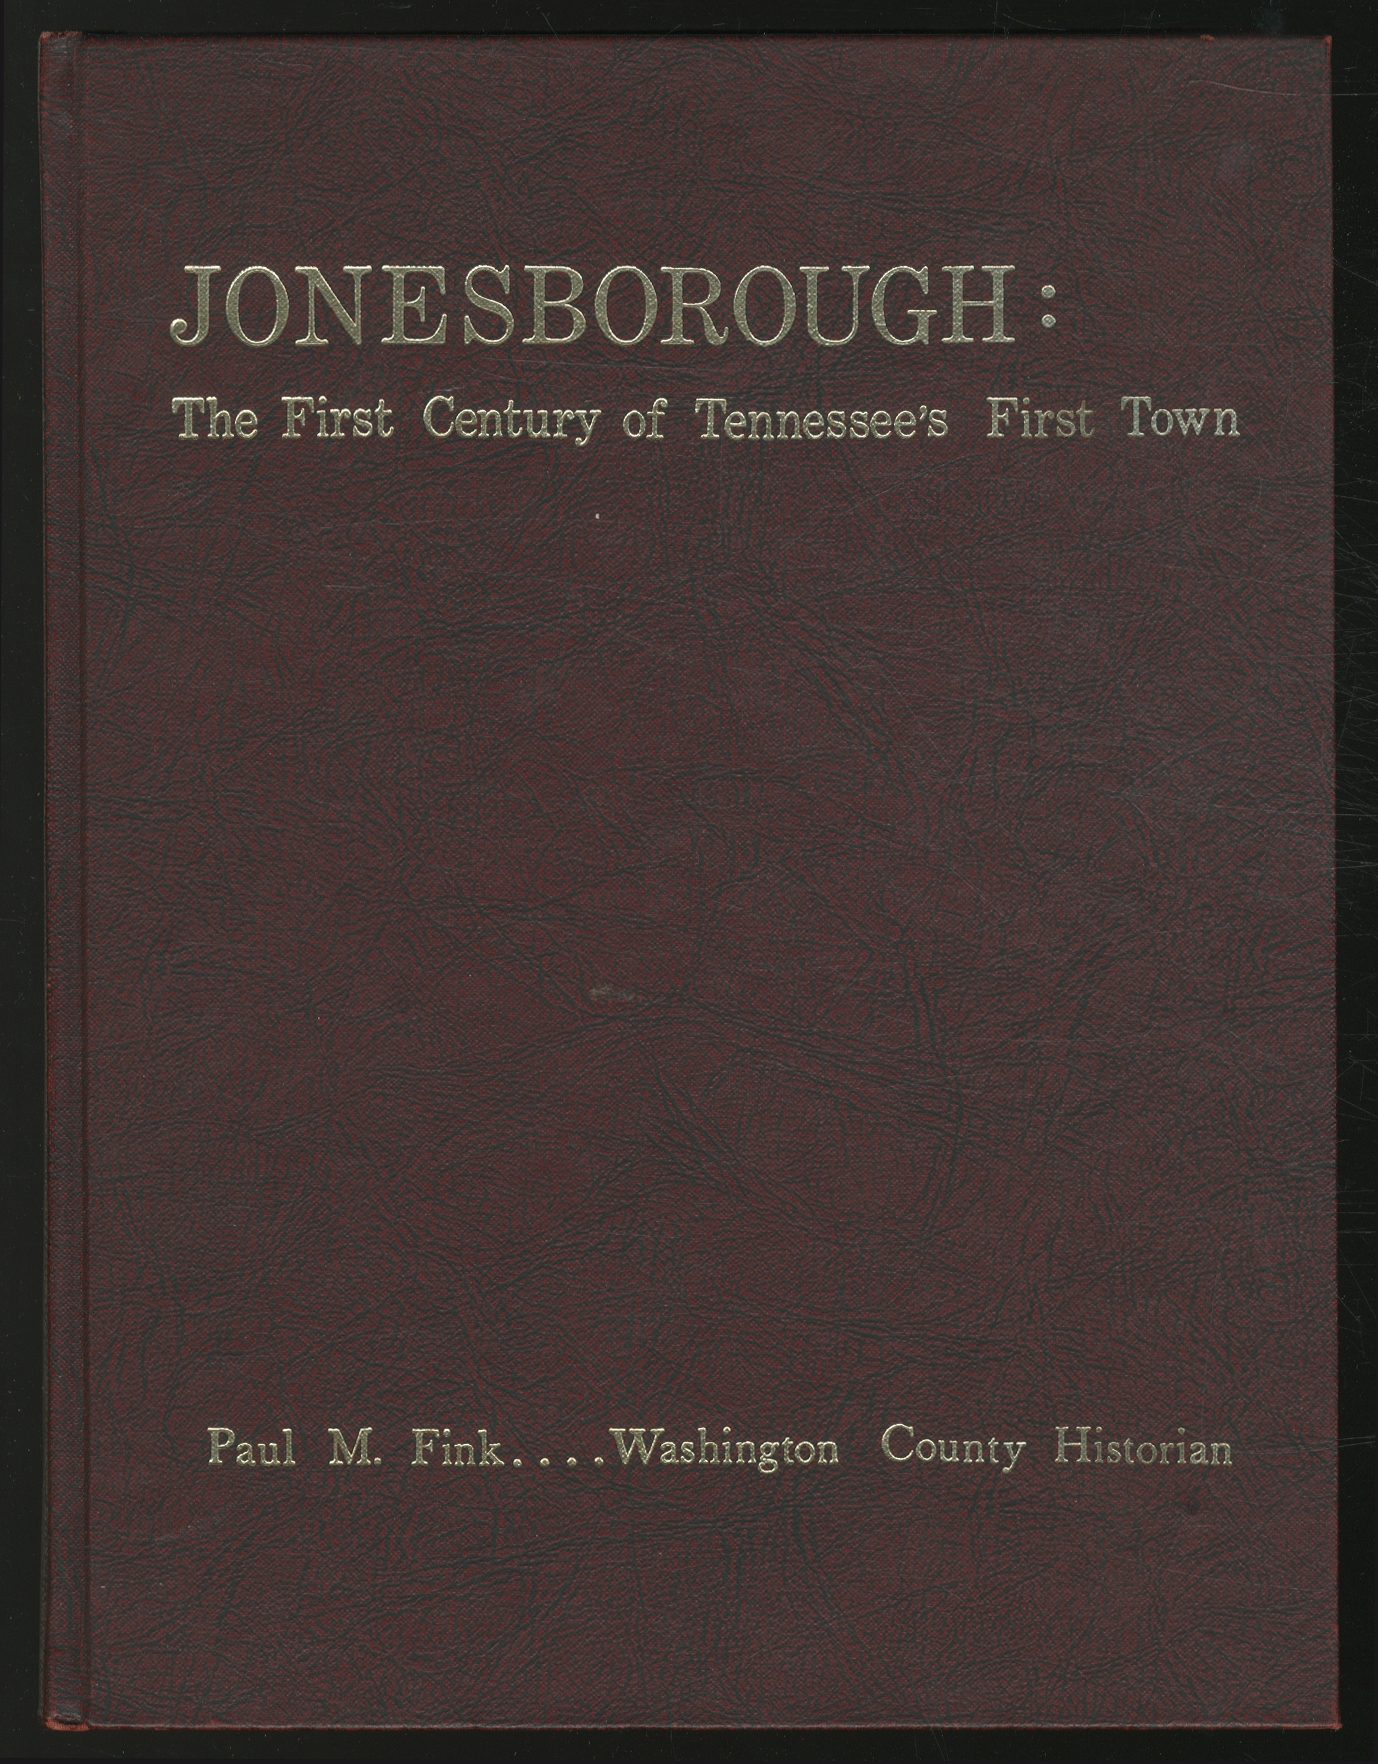 Jonesborough: The First Century of Tennessee's First: FINK, Paul M.